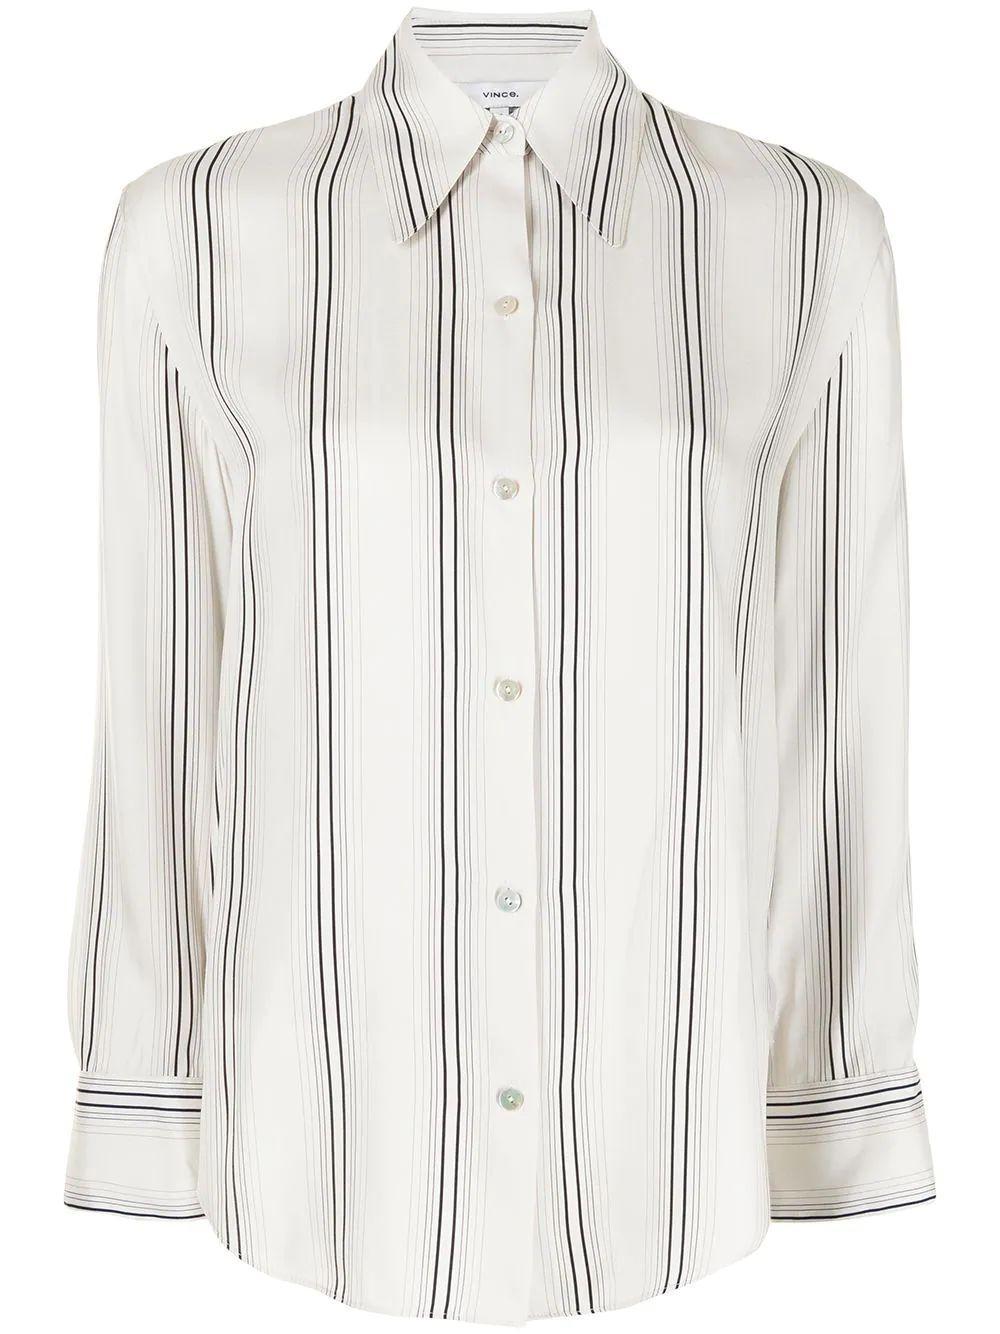 Striped Button Down Shirt Item # V729812324